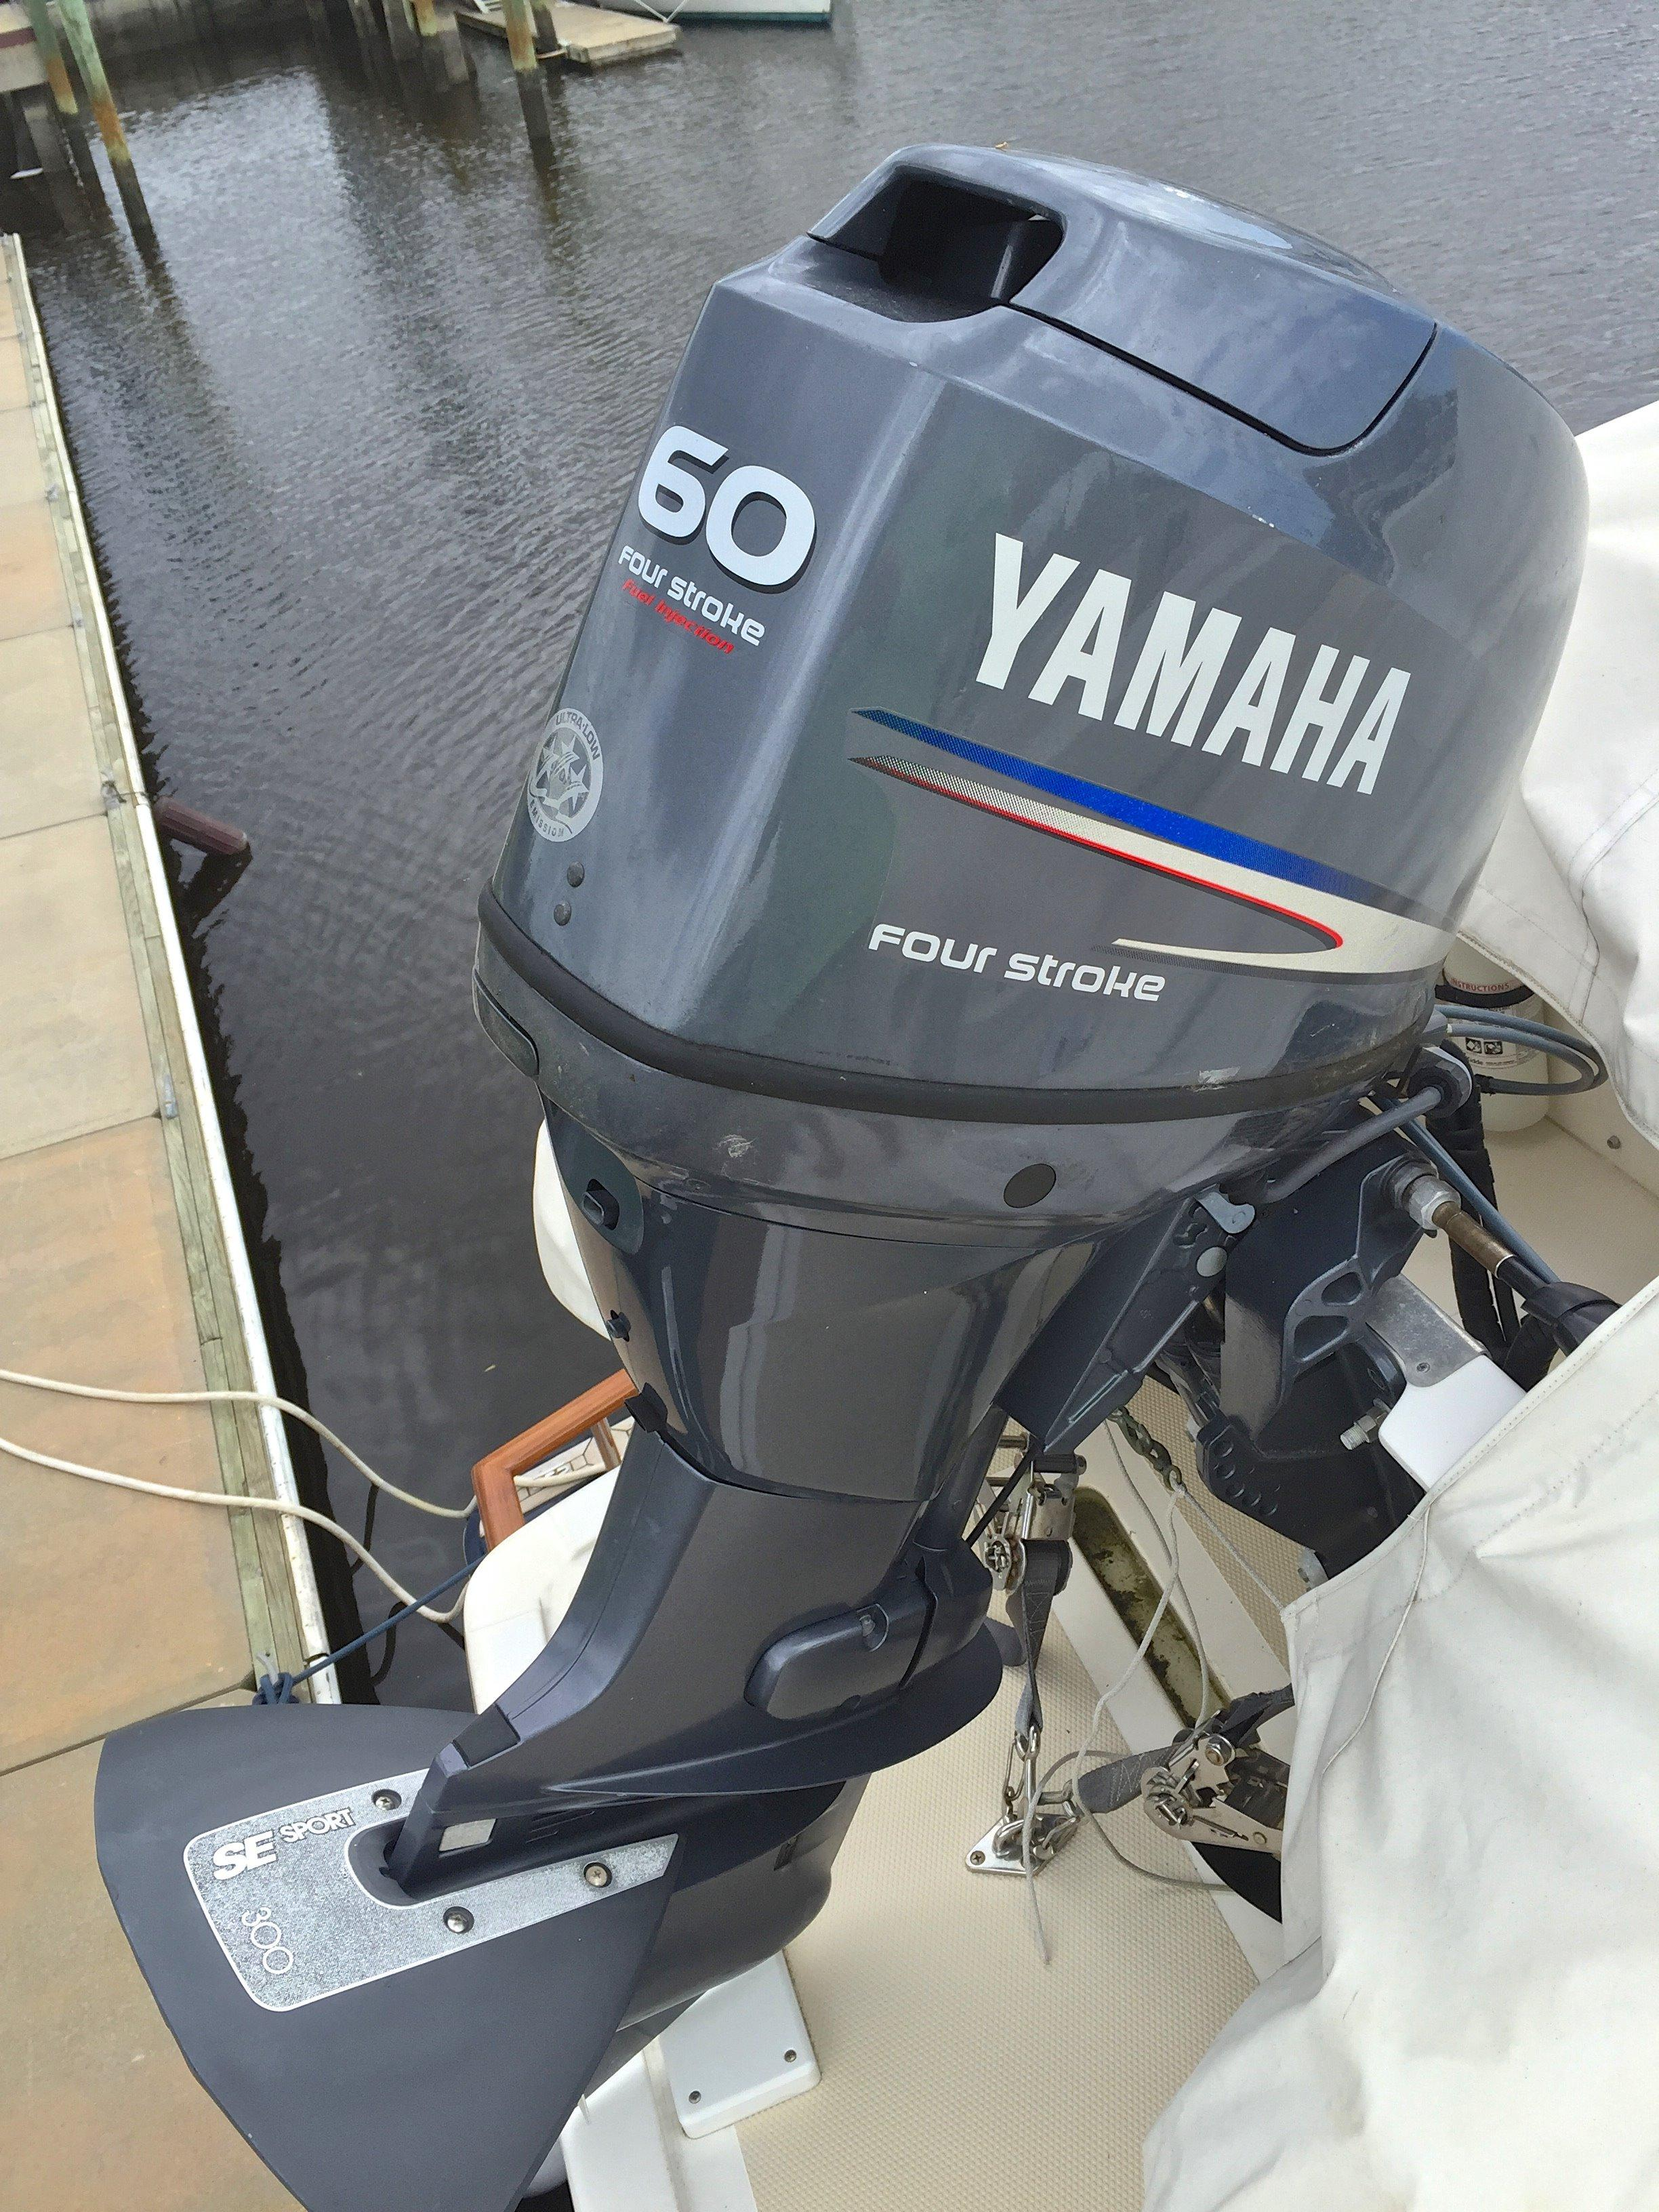 60hp Yamaha outboard